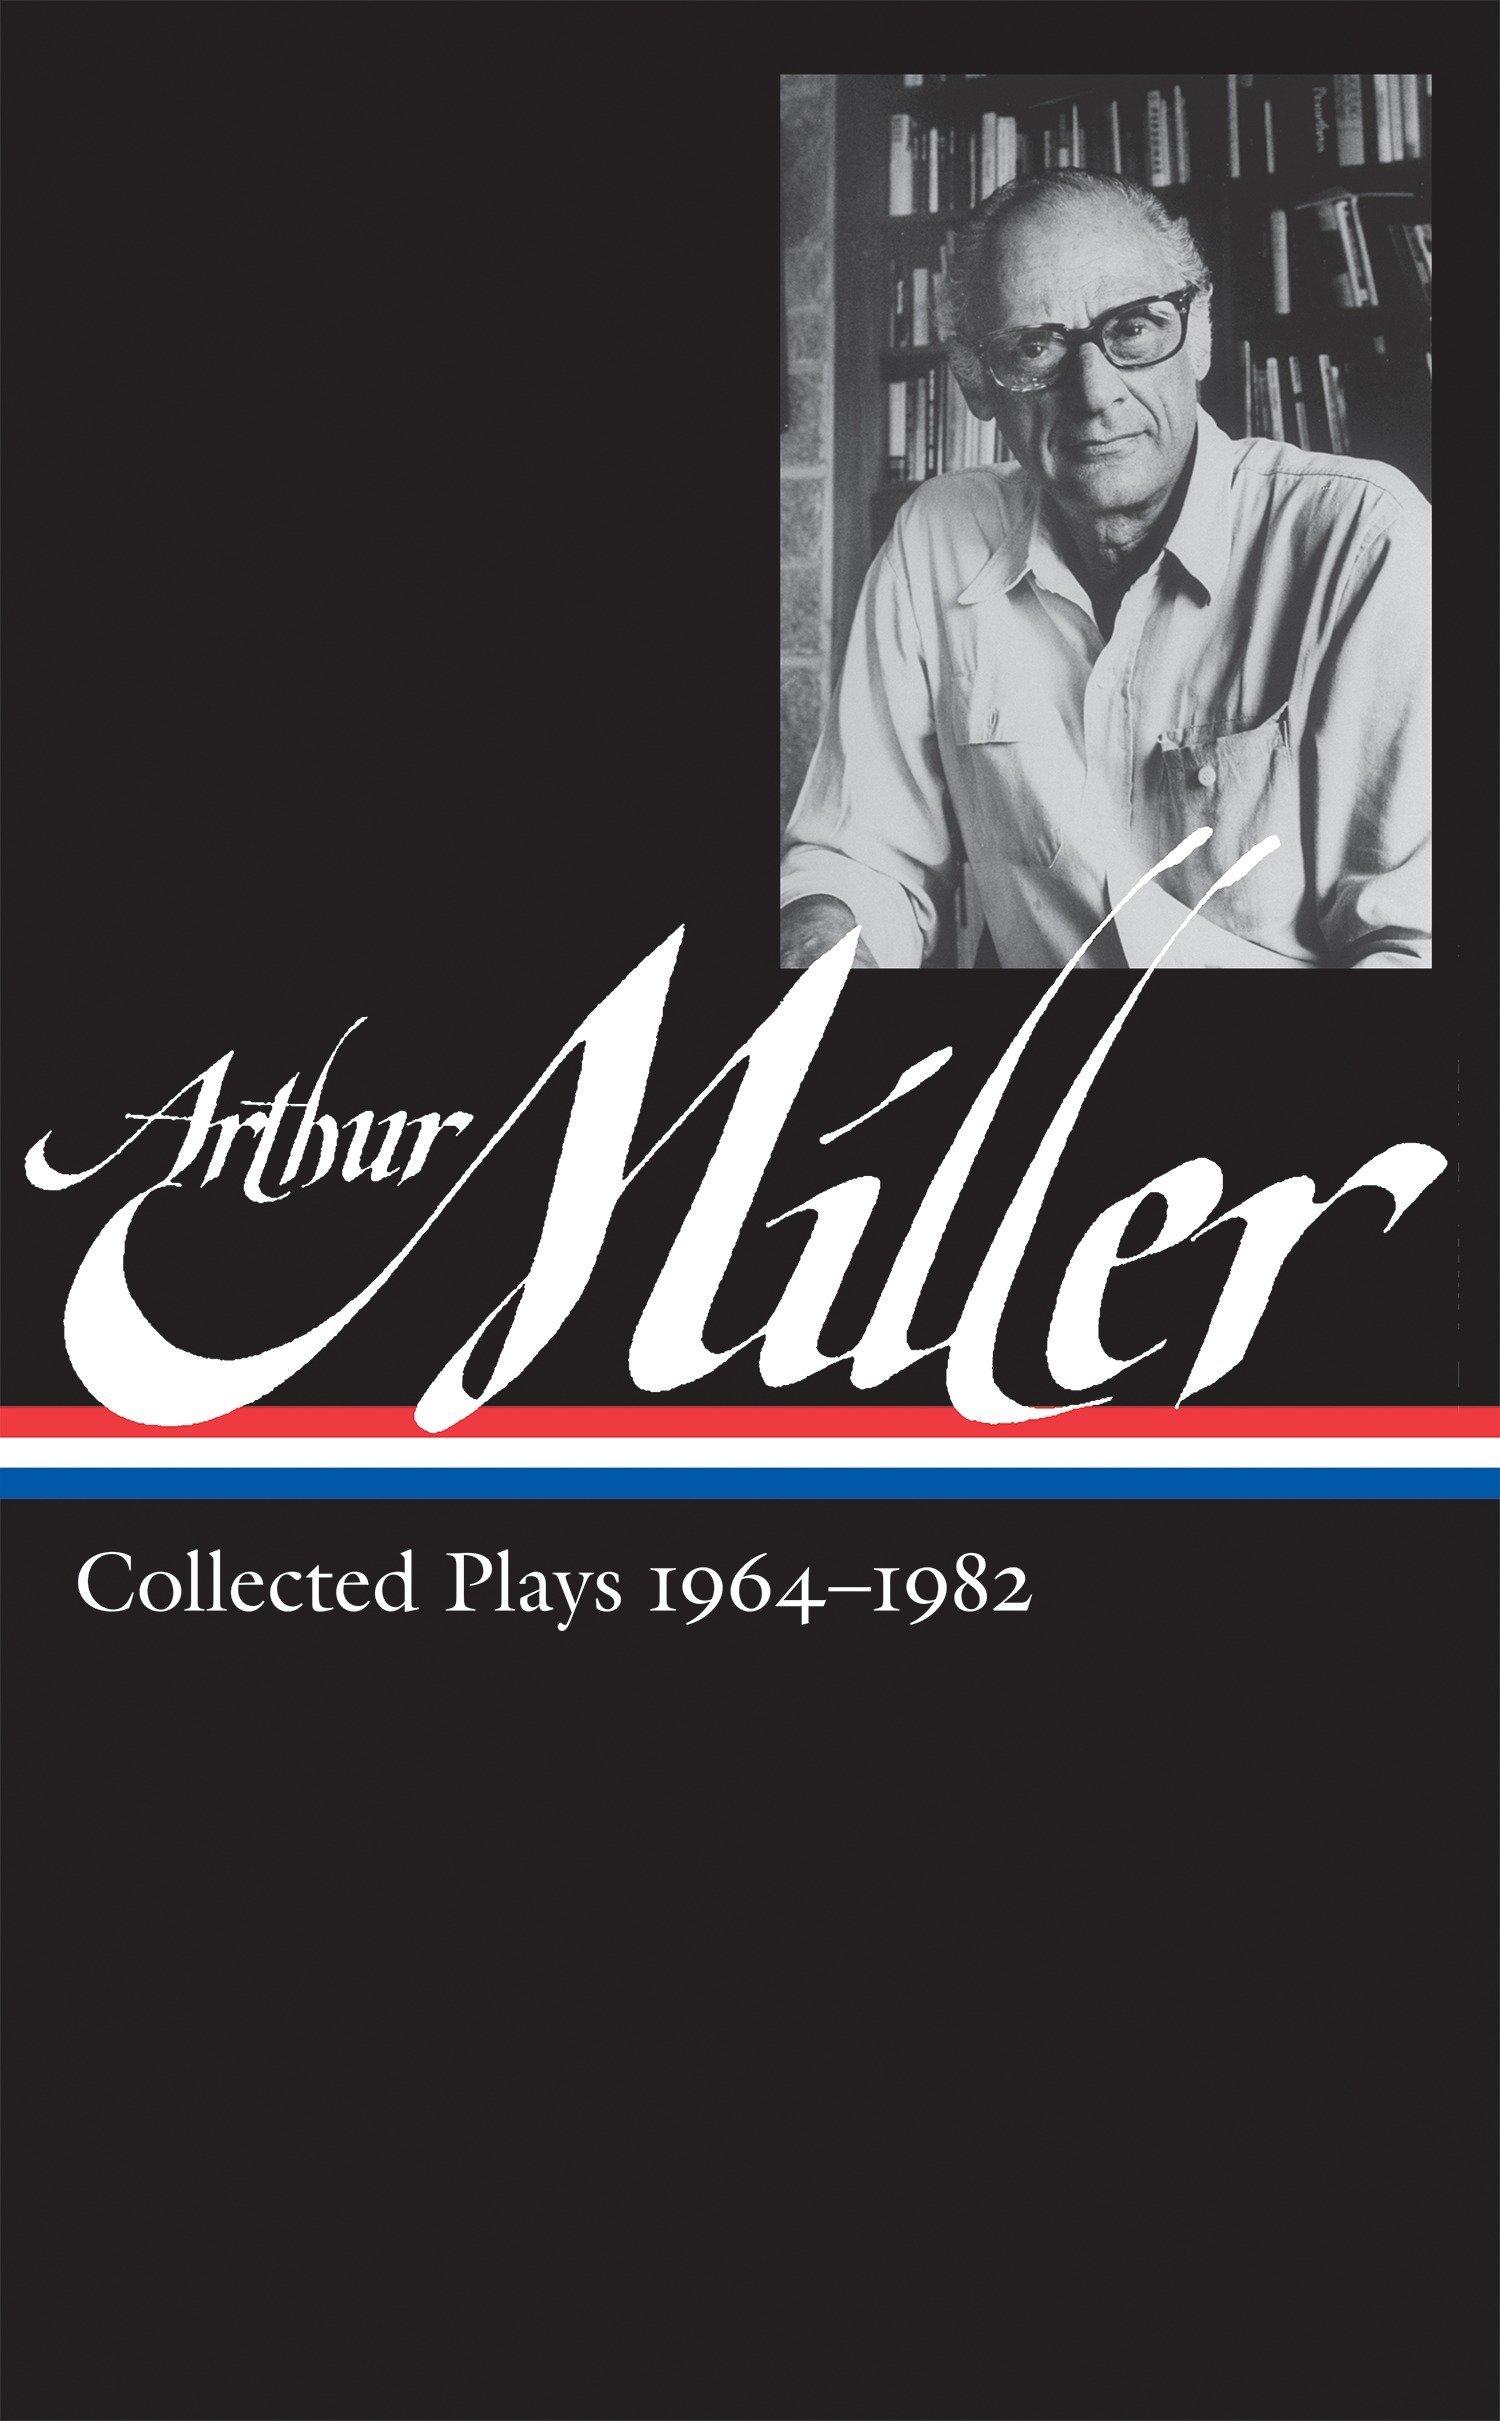 arthur miller collected plays vol 2 1964 1982 loa 223 library of america arthur miller edition